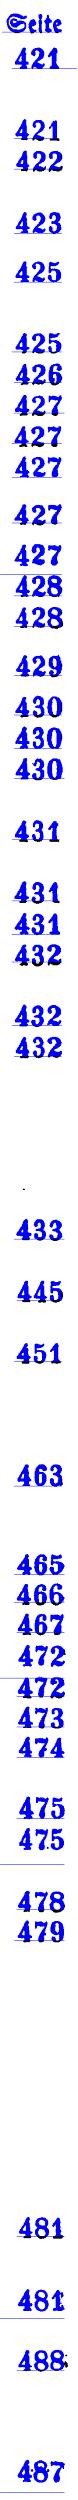 [merged small][ocr errors][ocr errors][ocr errors][ocr errors][ocr errors][ocr errors][ocr errors][ocr errors][ocr errors][ocr errors][ocr errors][ocr errors][merged small][ocr errors]